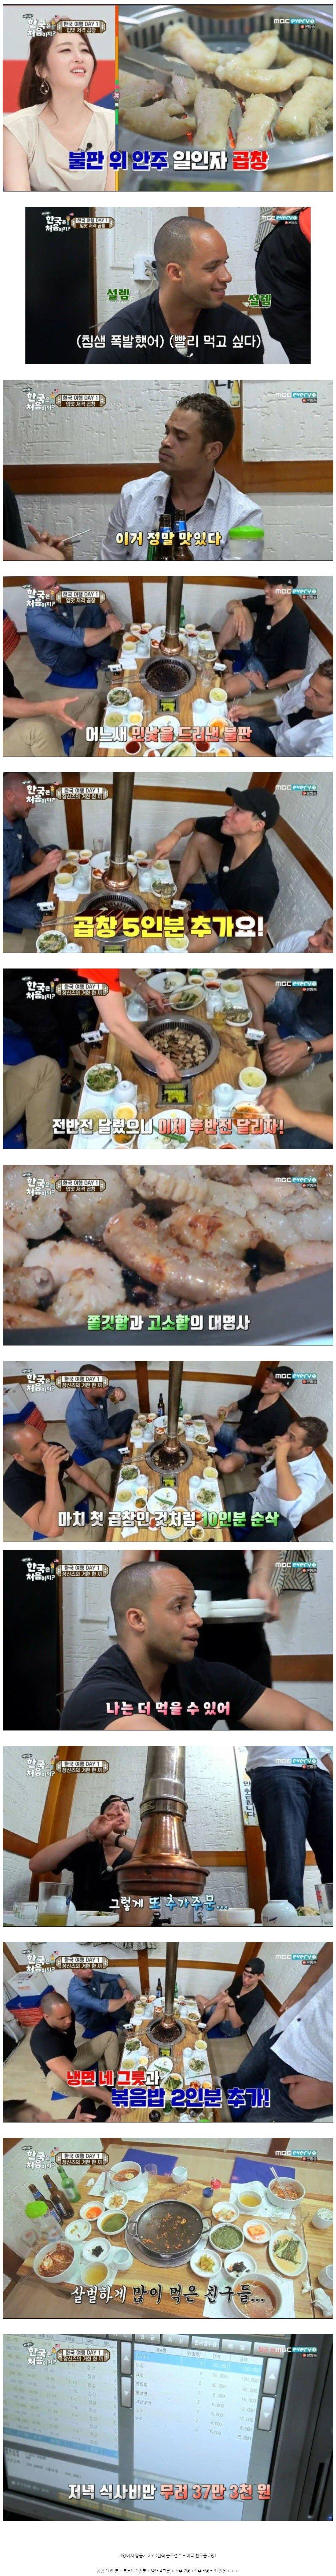 grwedddf.jpg 한국에 와서 곱창을 처음먹는 미국친구들.jpg